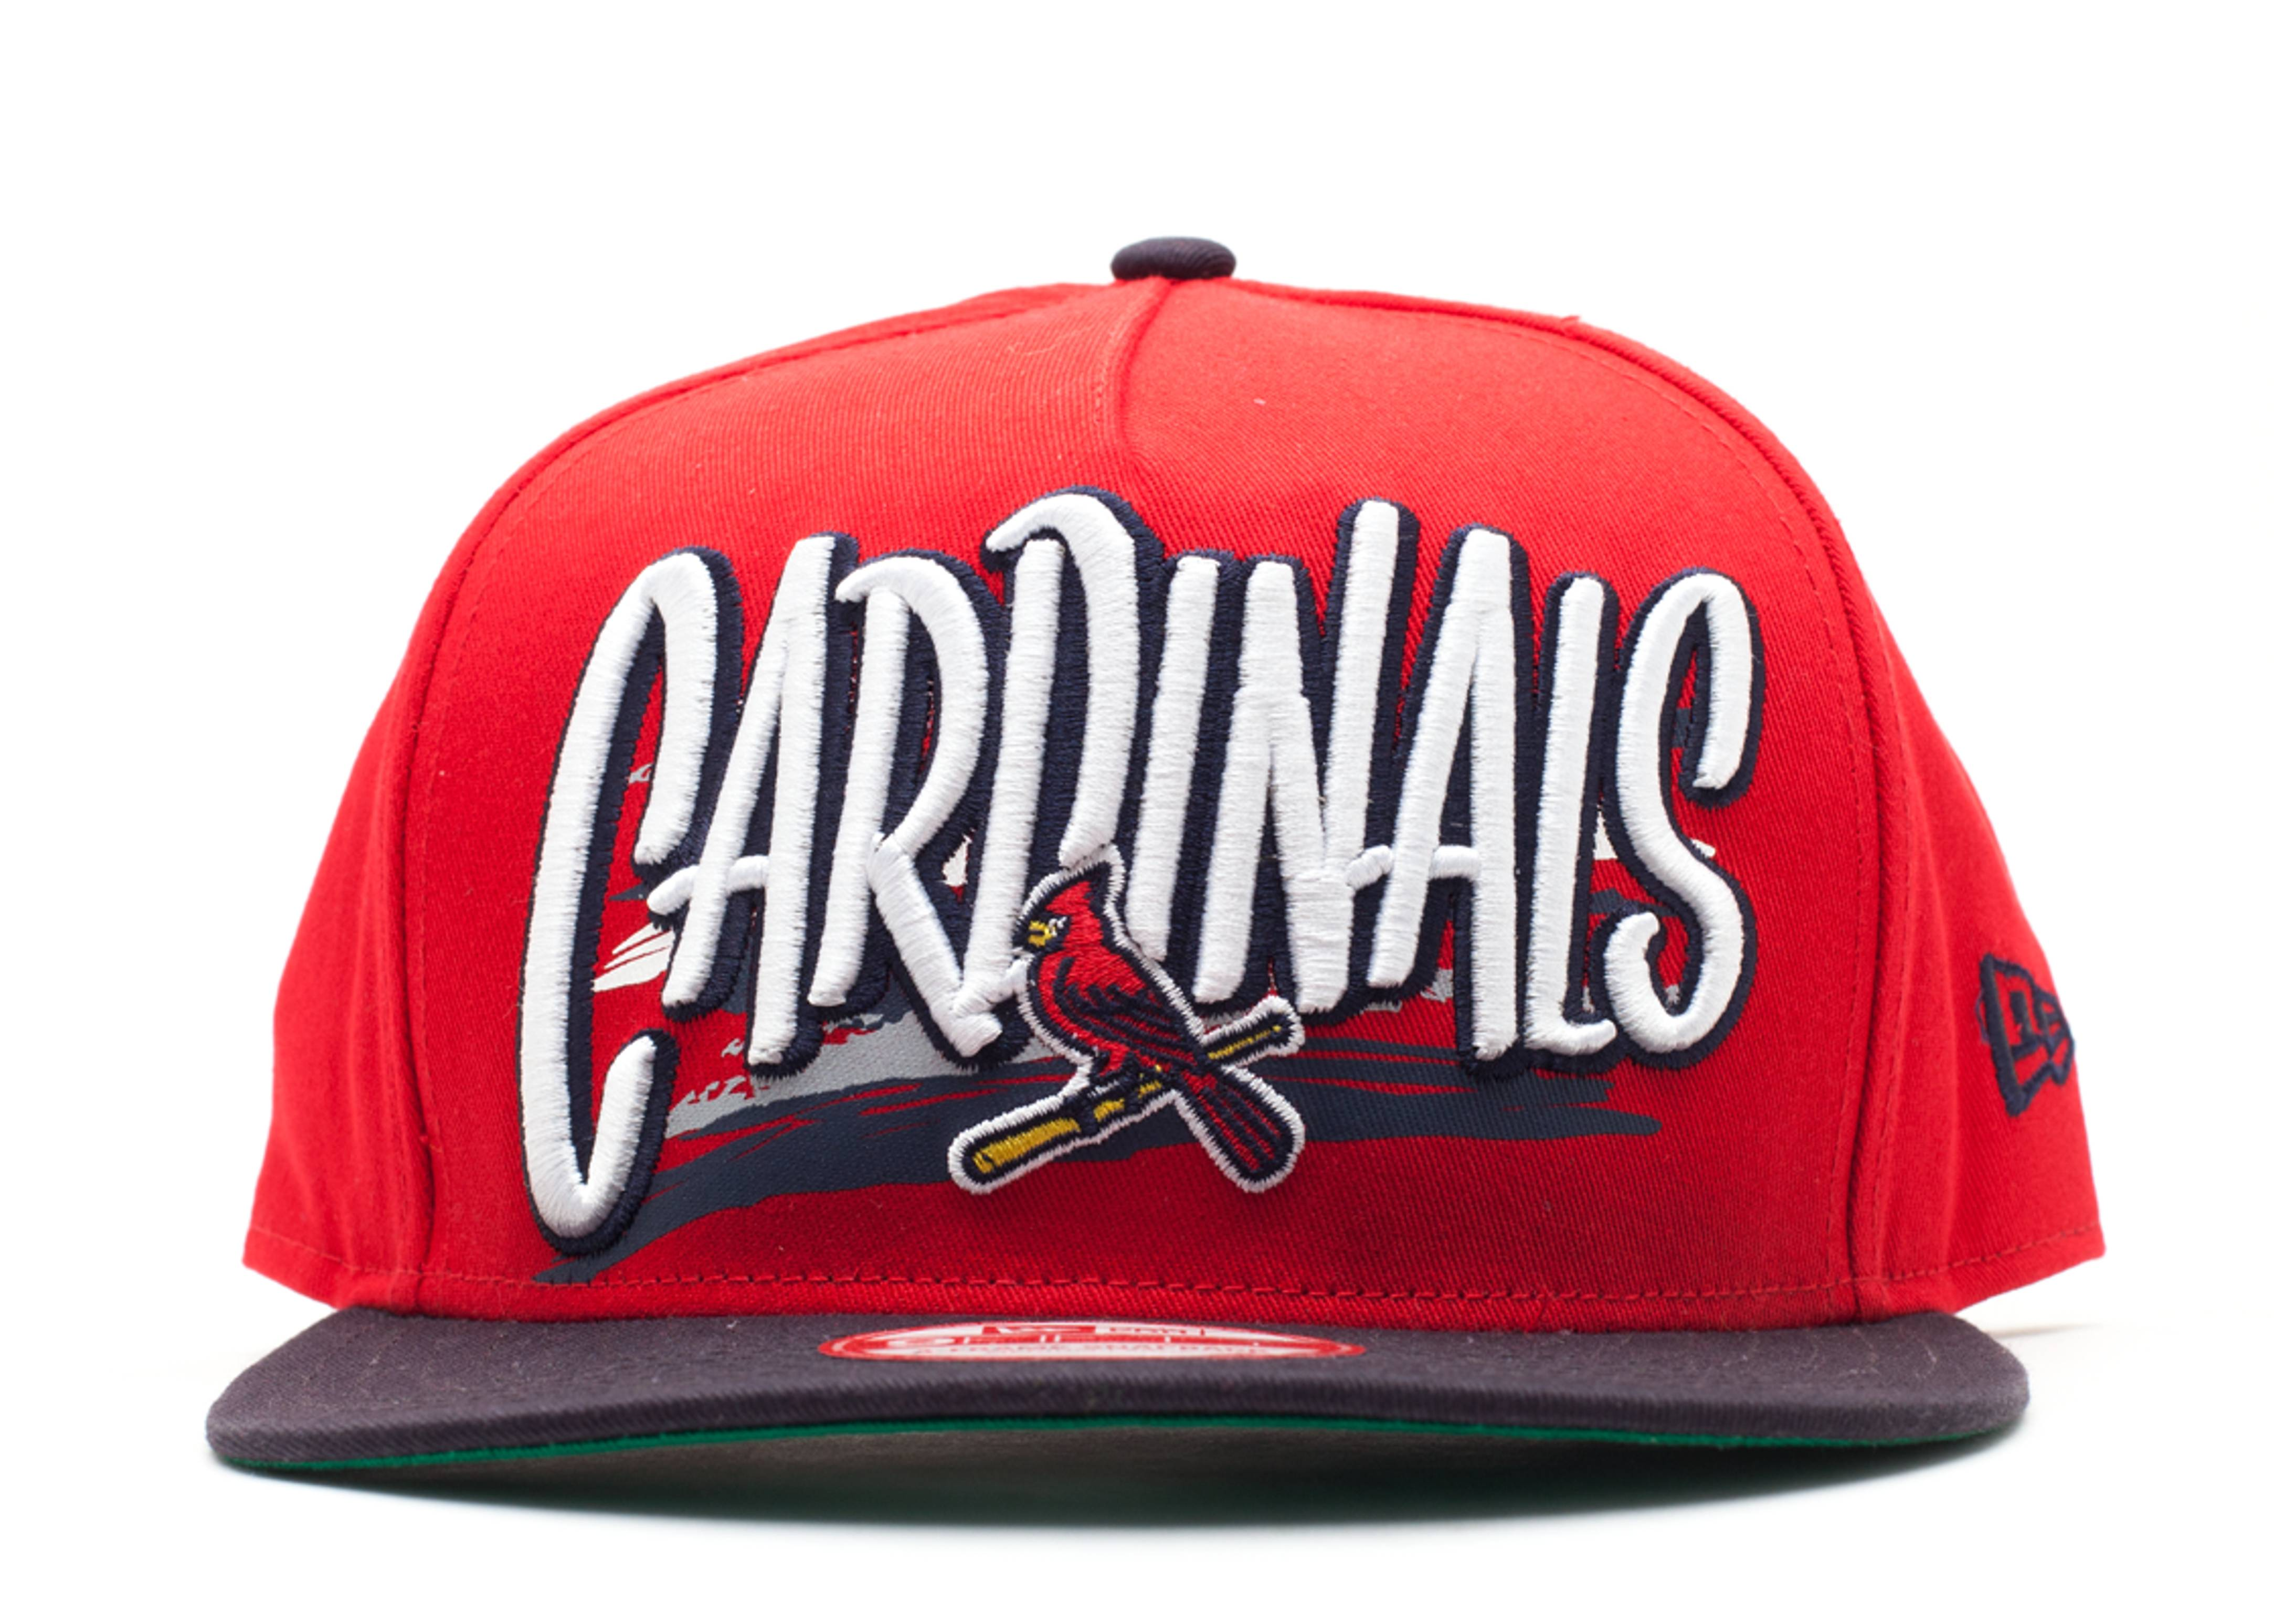 st. louis cardinals snap-back